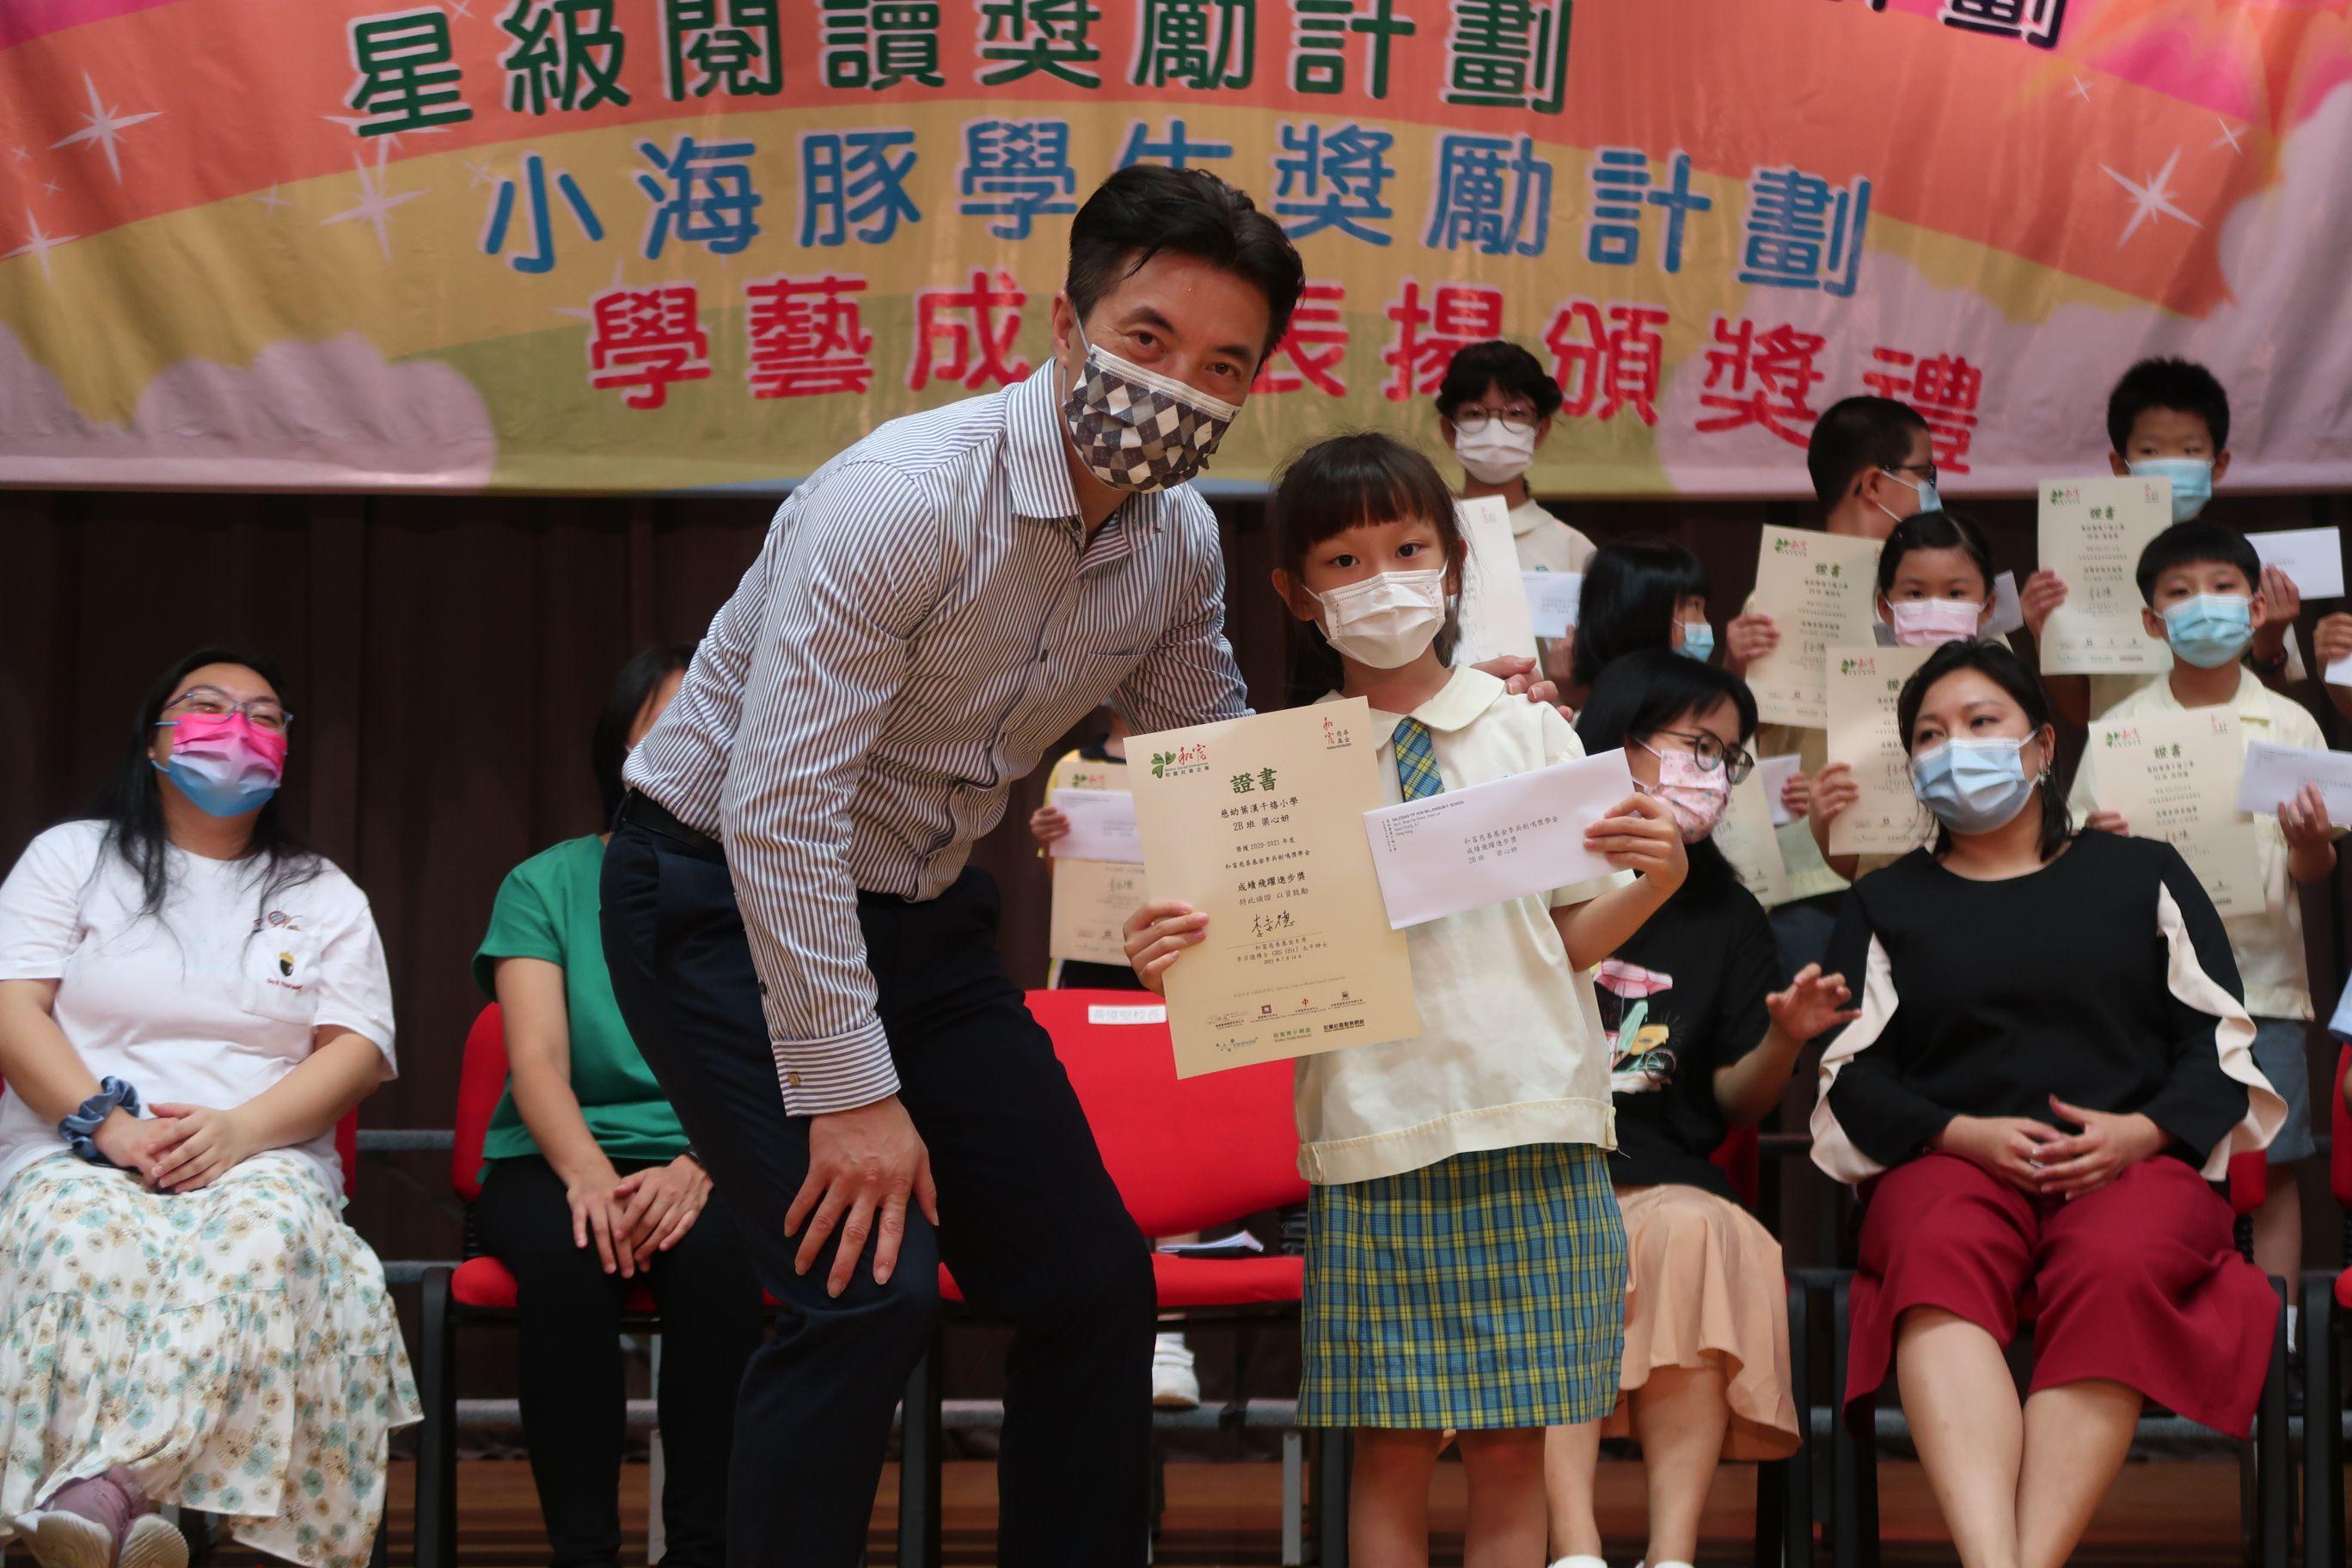 https://syh.edu.hk/sites/default/files/img_5940.jpg